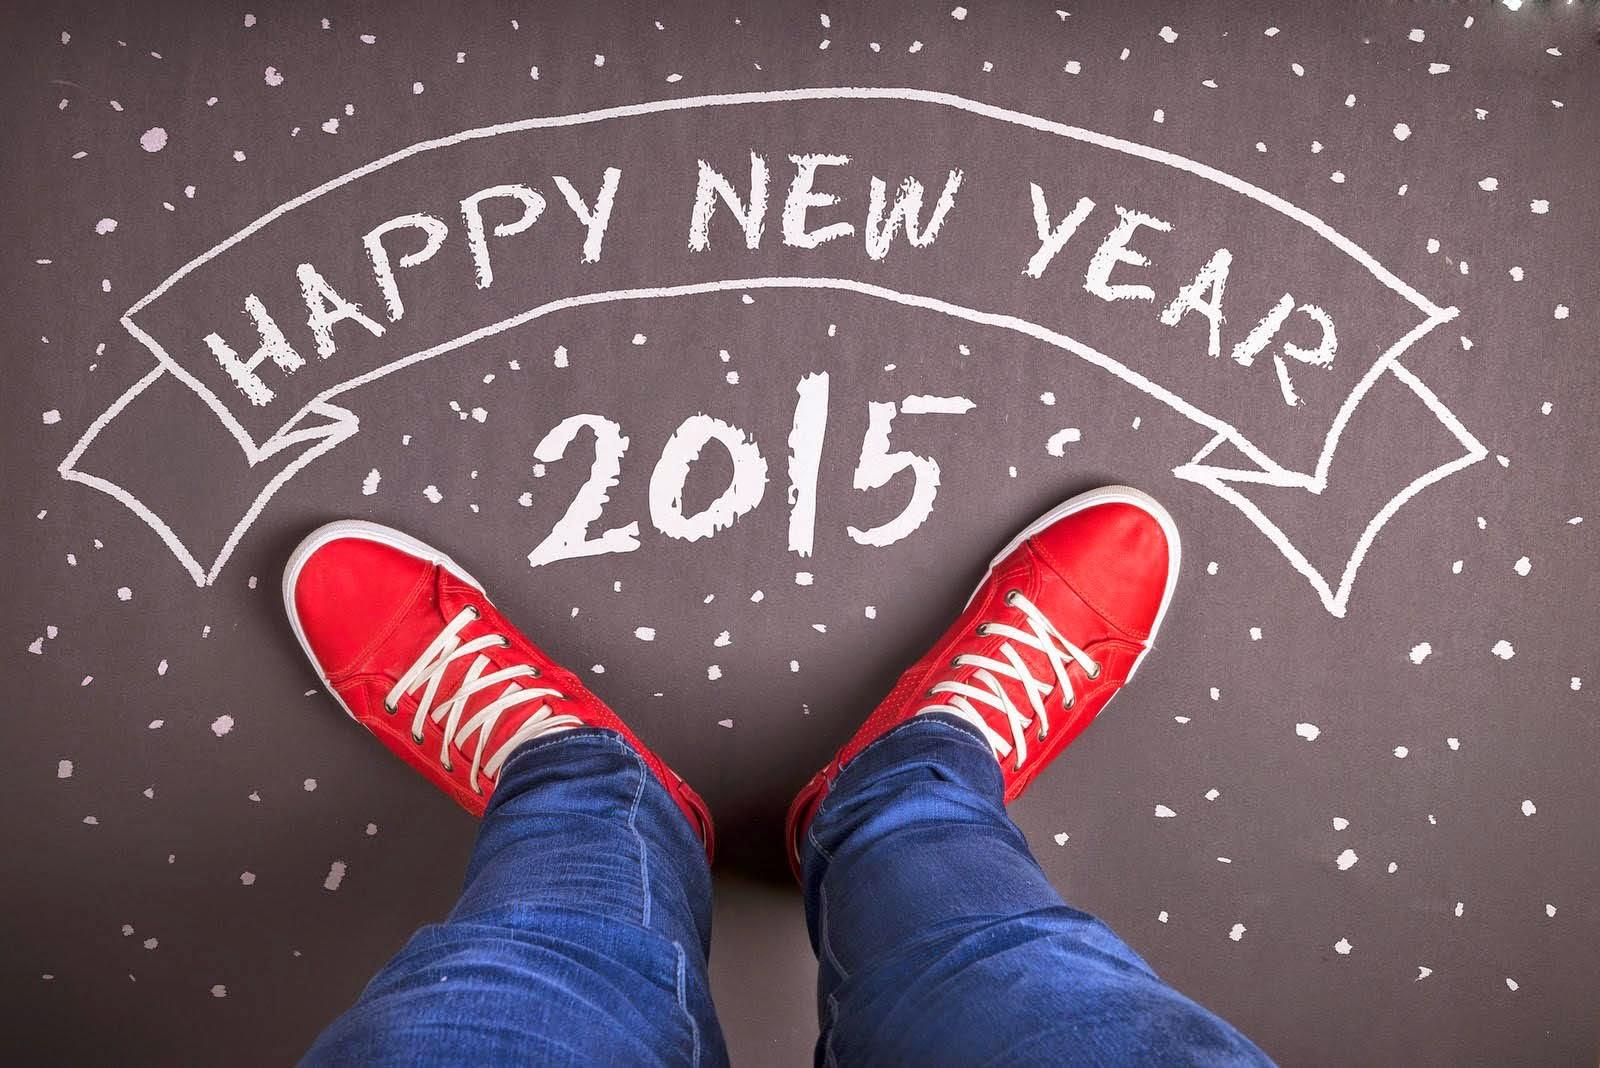 Happy New Year 2015 Beautifull - eCards